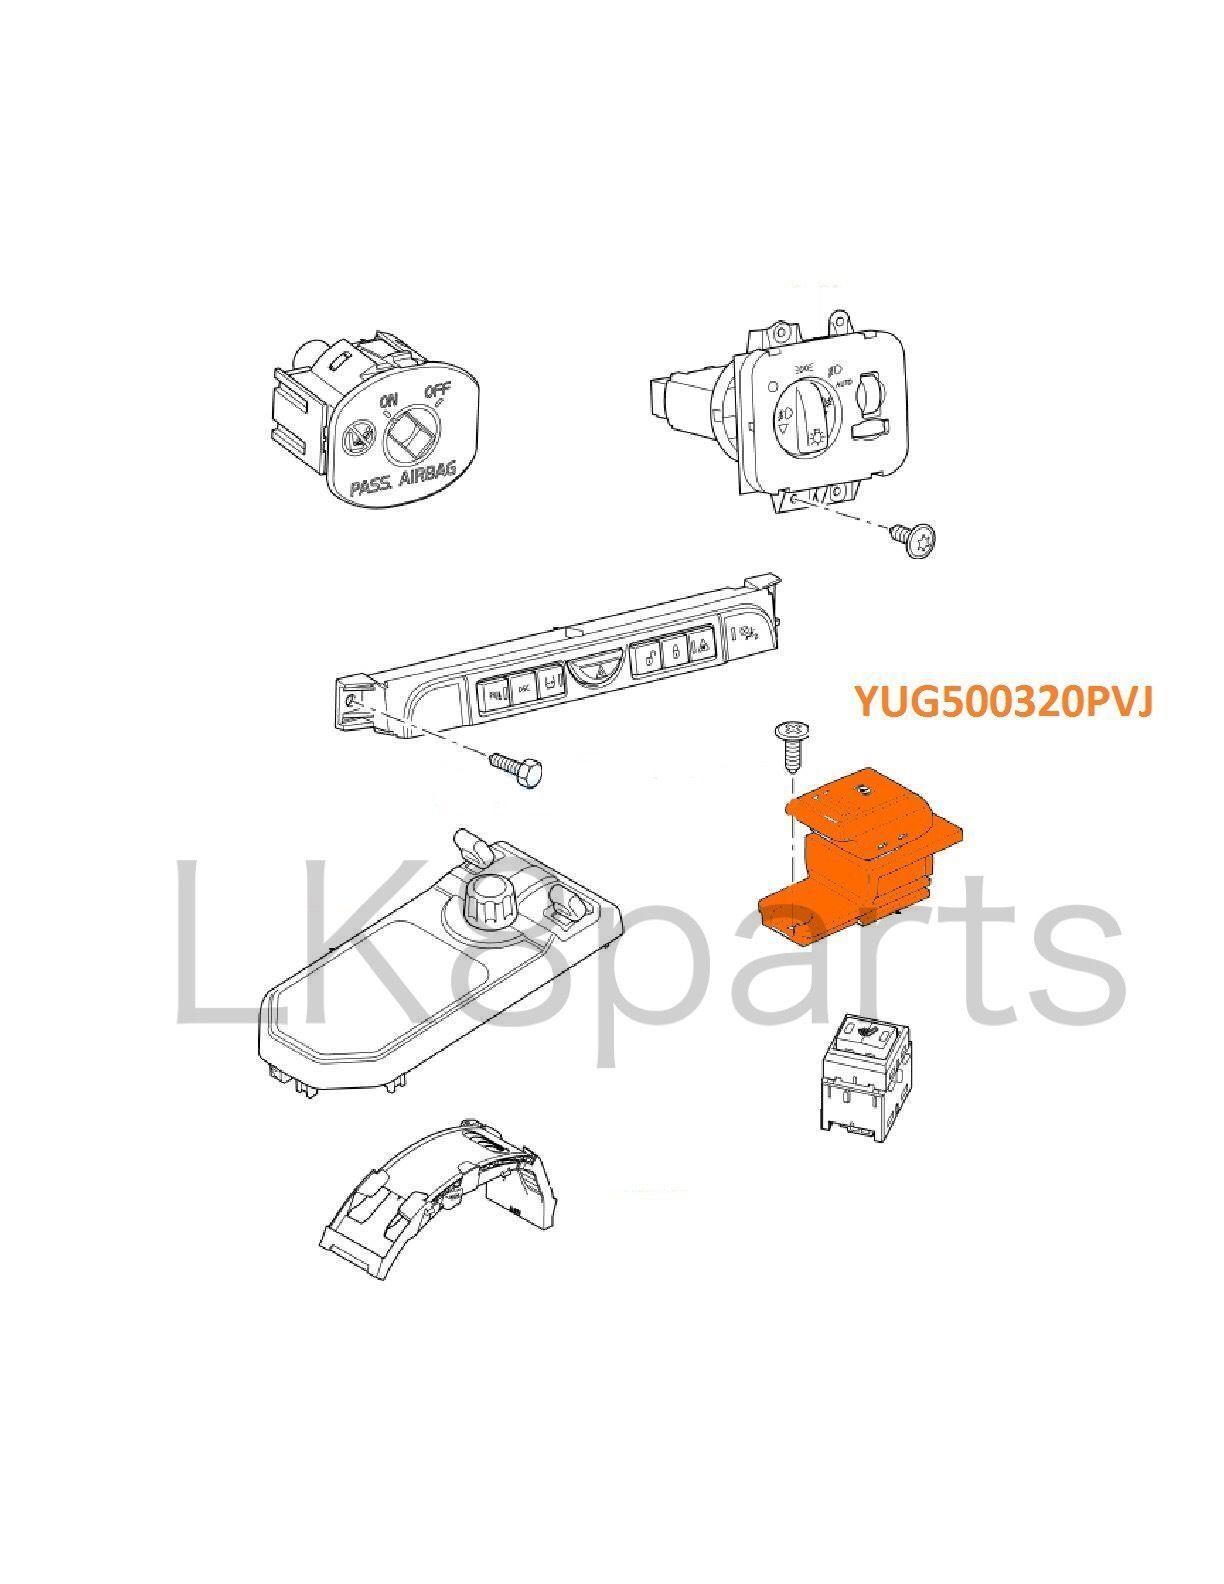 Land rover lr3 parking brake switch yug500320pvj genuine new